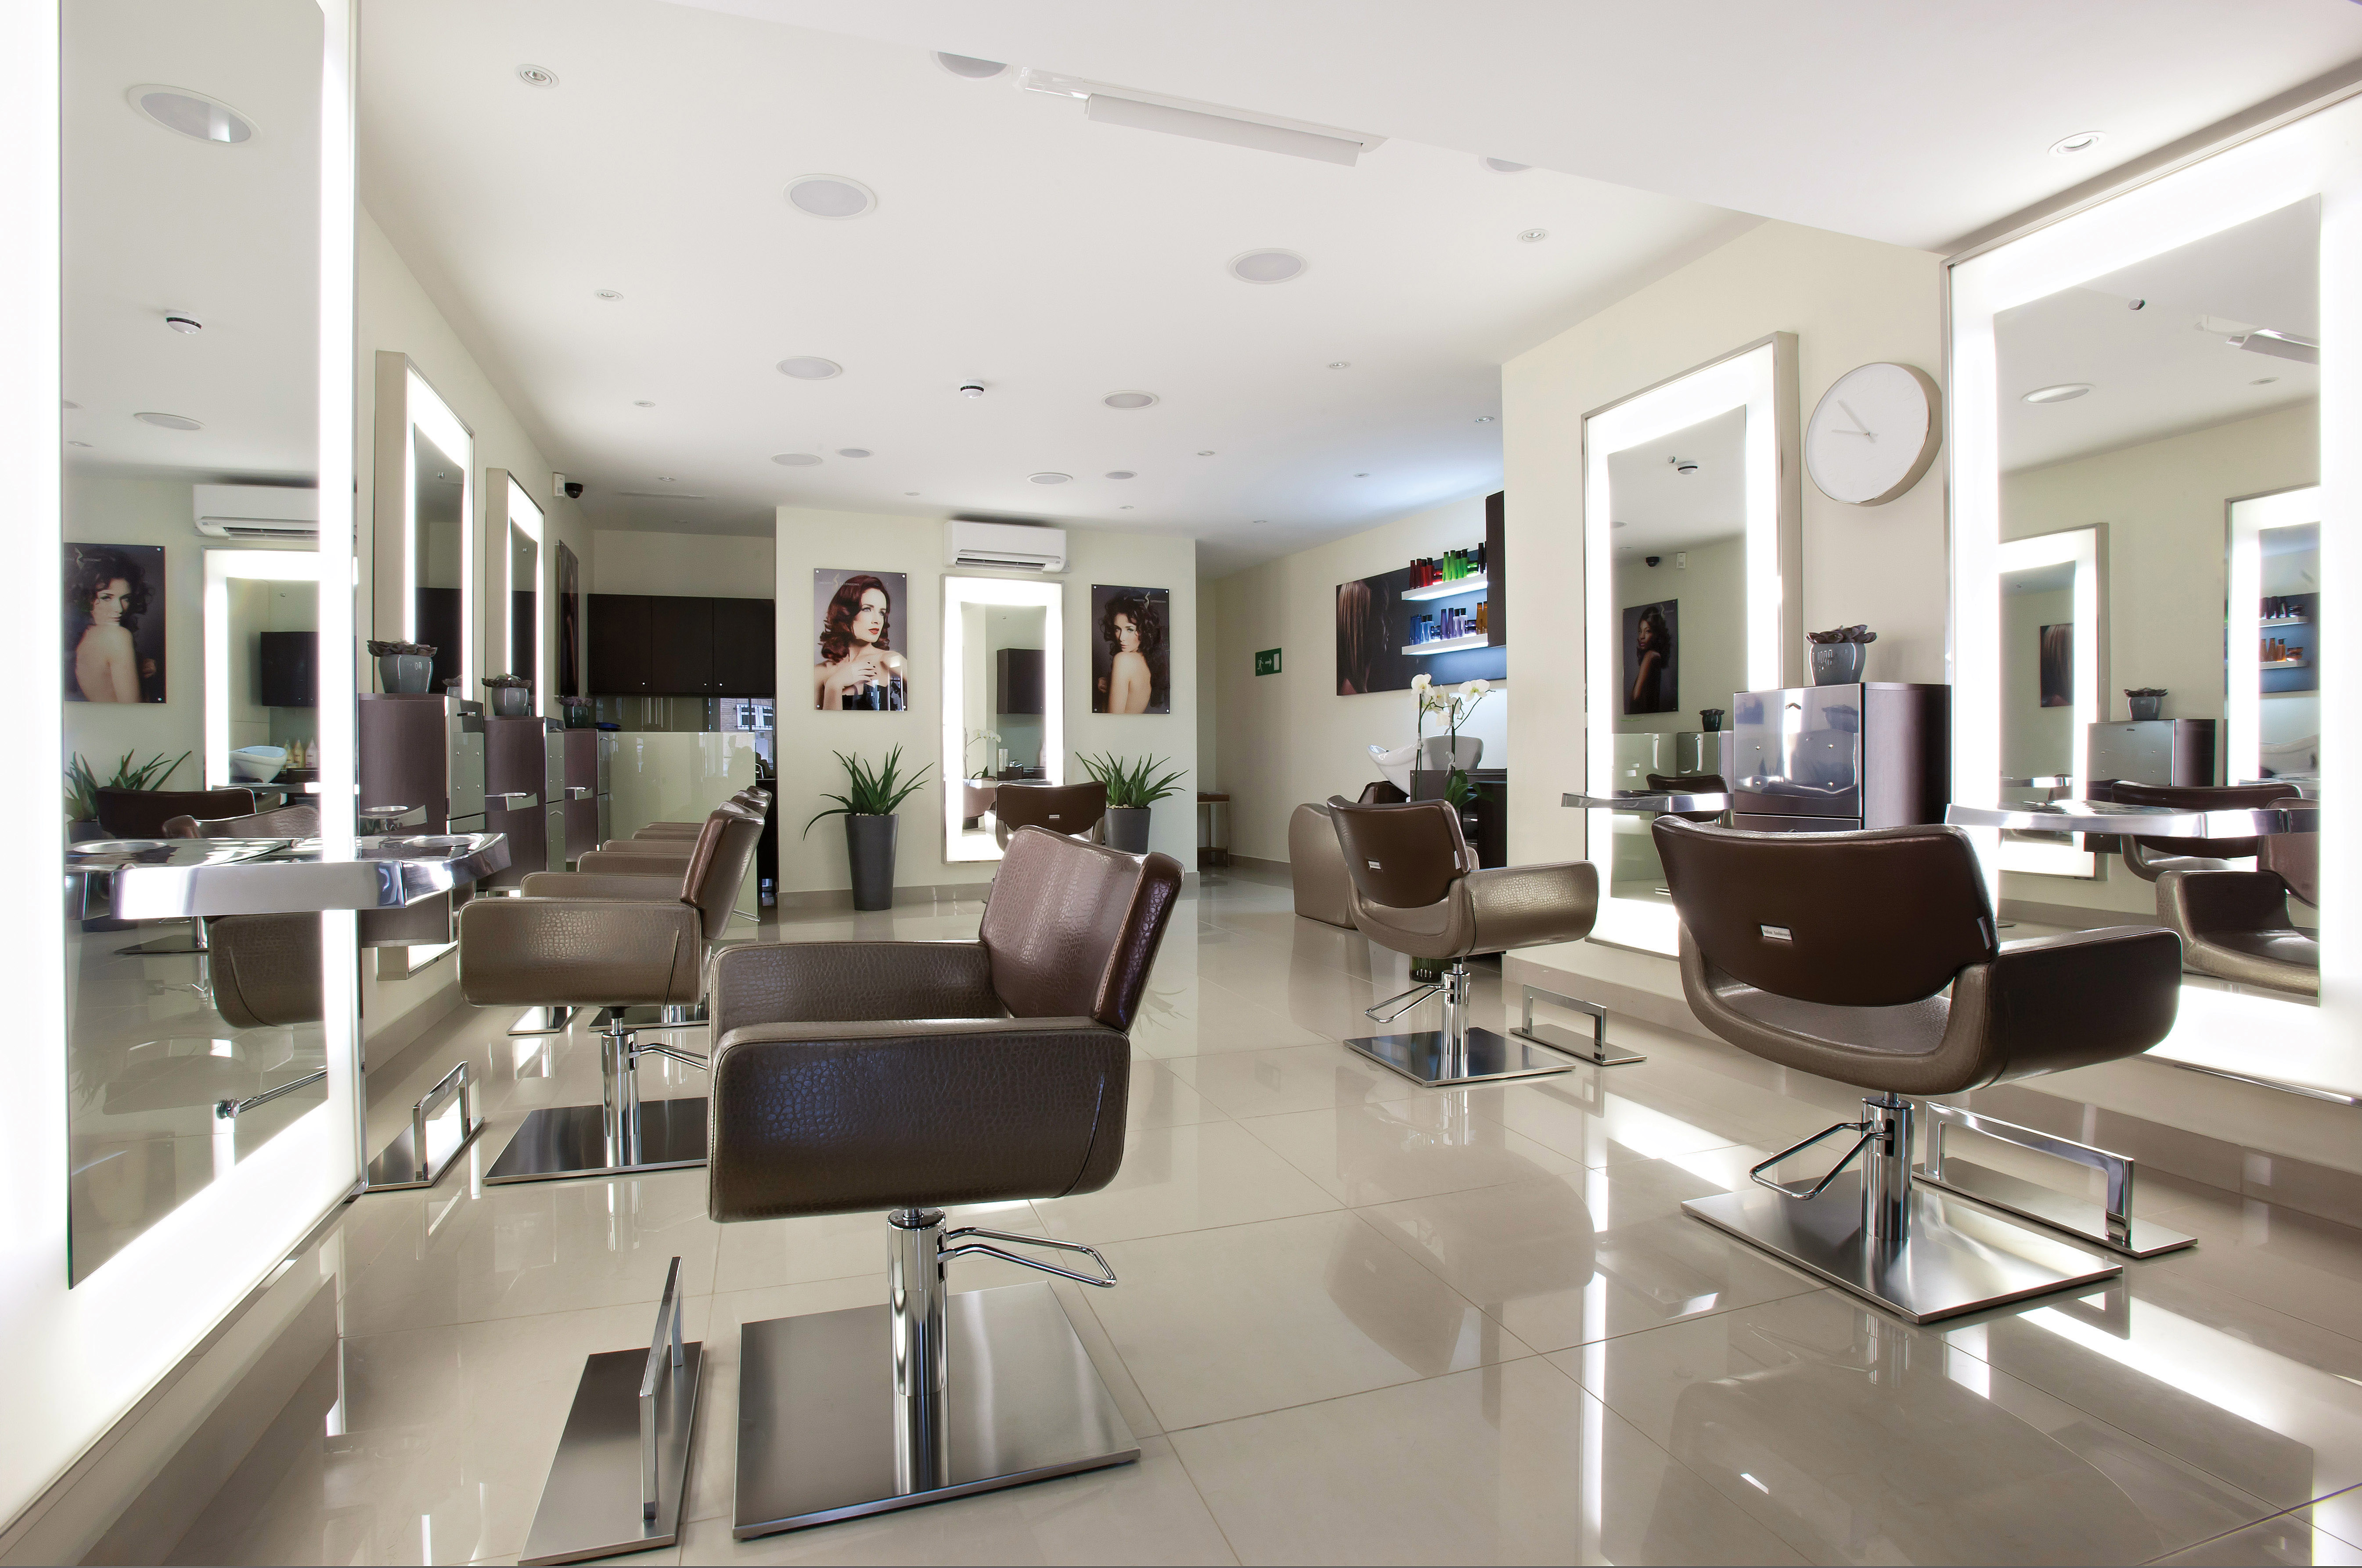 Salonsmart Expands Salon Equipment Line With Italian Brand